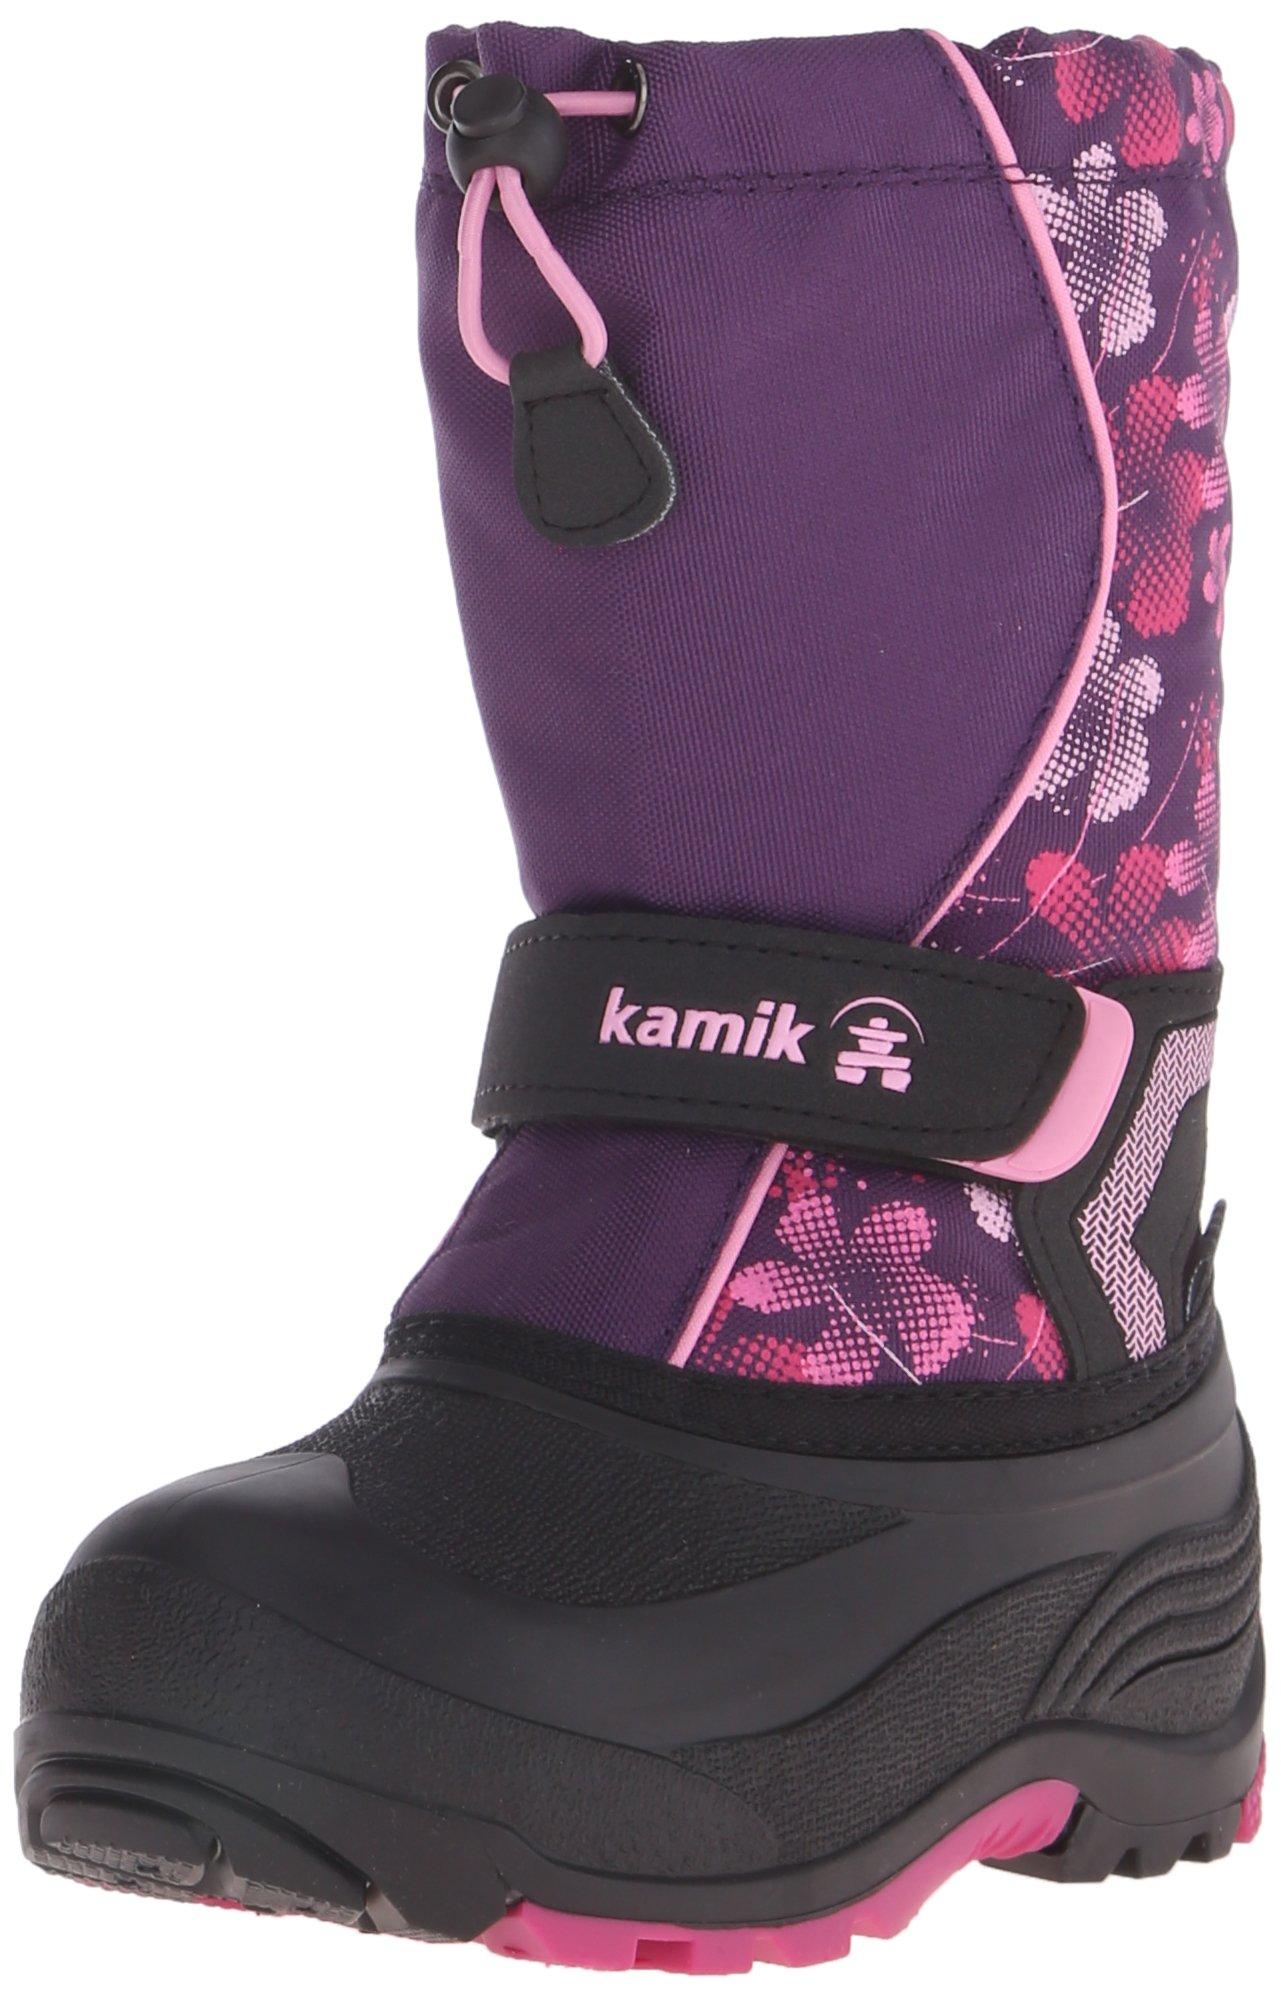 Kamik Snowbank2 Snow Boot (Toddler/Little Kid/Big Kid), Eggplant/Magenta, 5 M US Big Kid